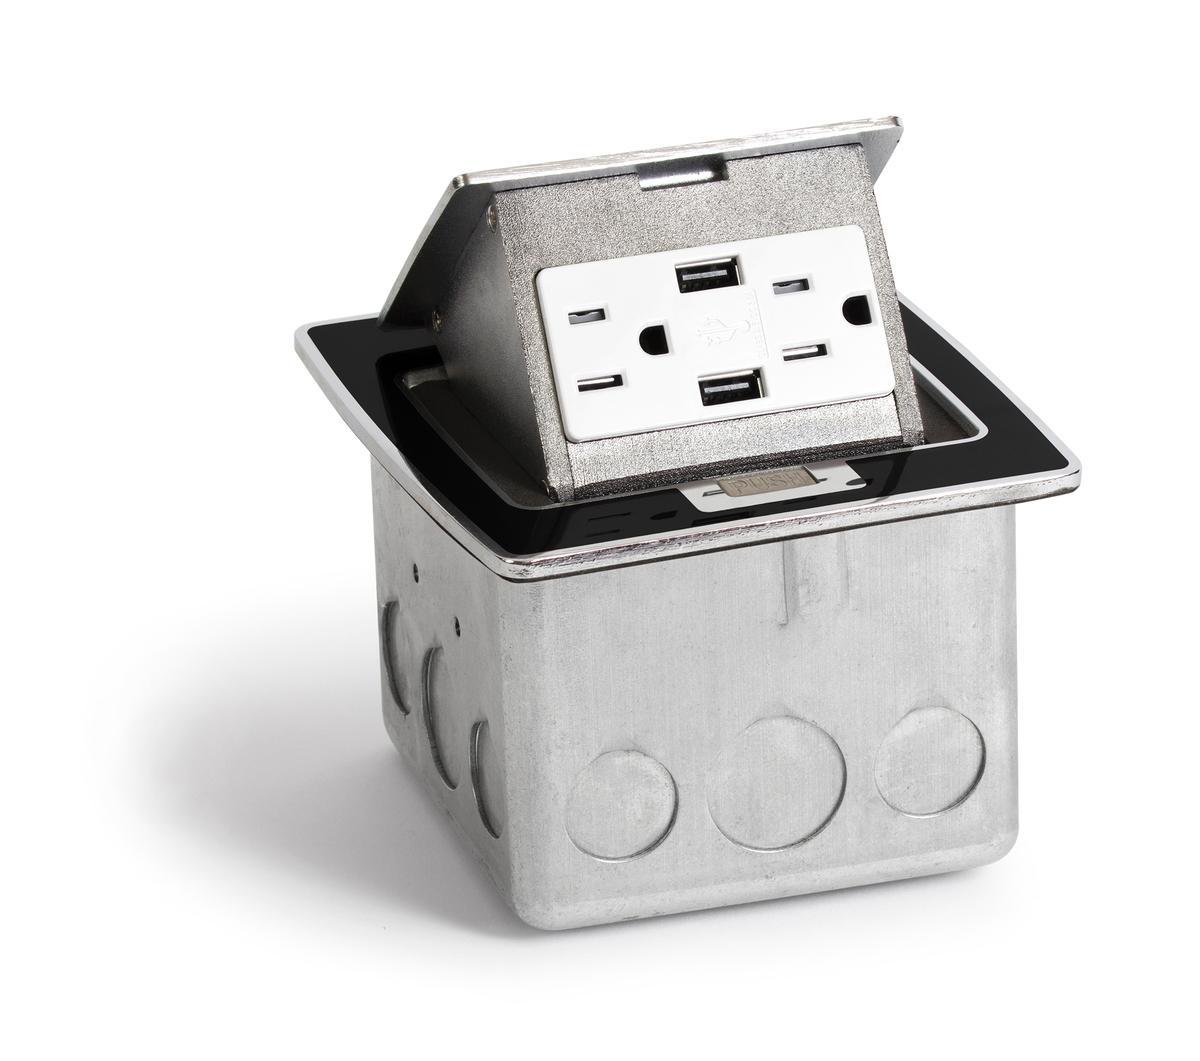 Lew Electric PUFP-CT-BK-2USB Countertop Pop Up Box w/ 2 USB & 2 Power ...